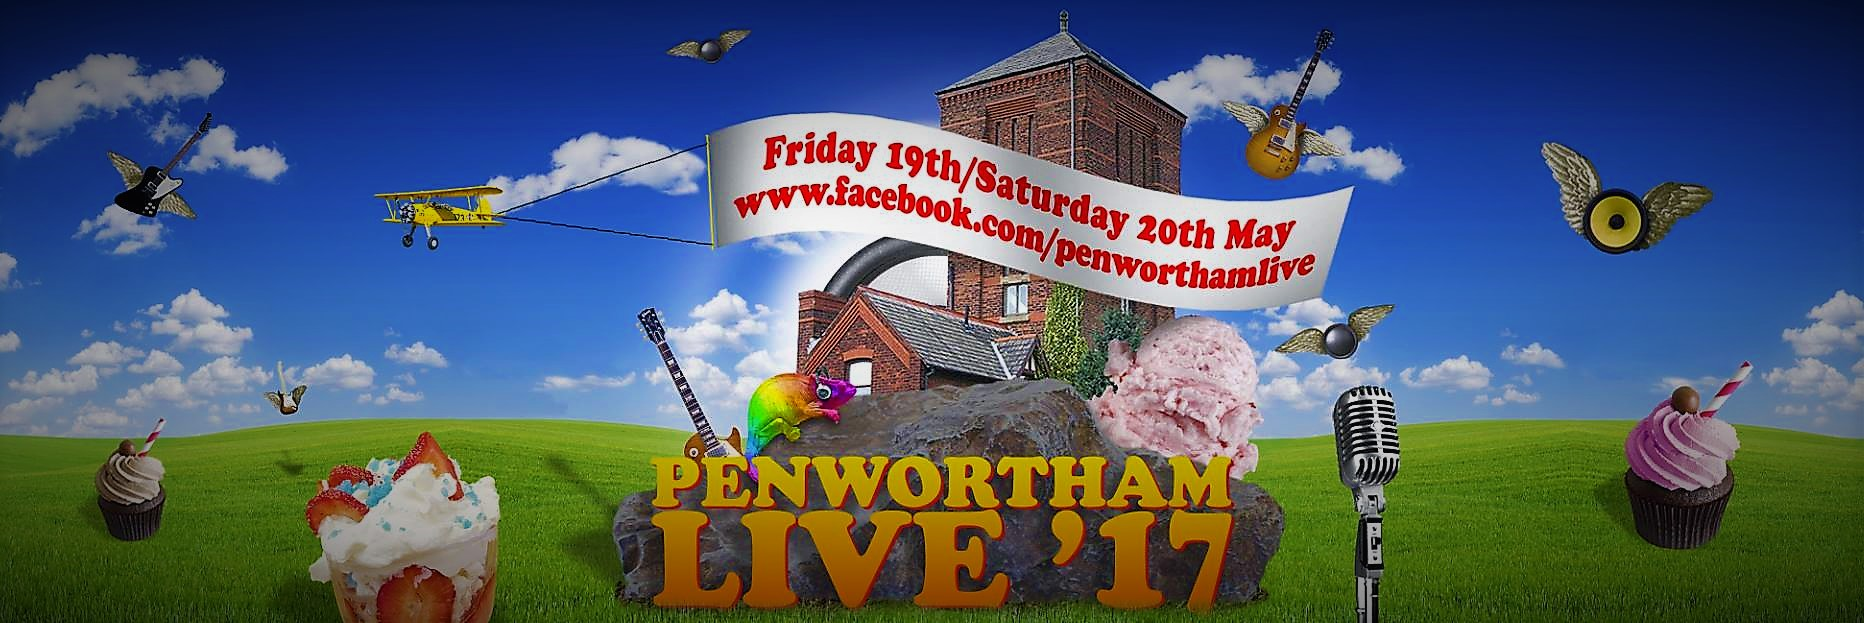 Penwortham Live